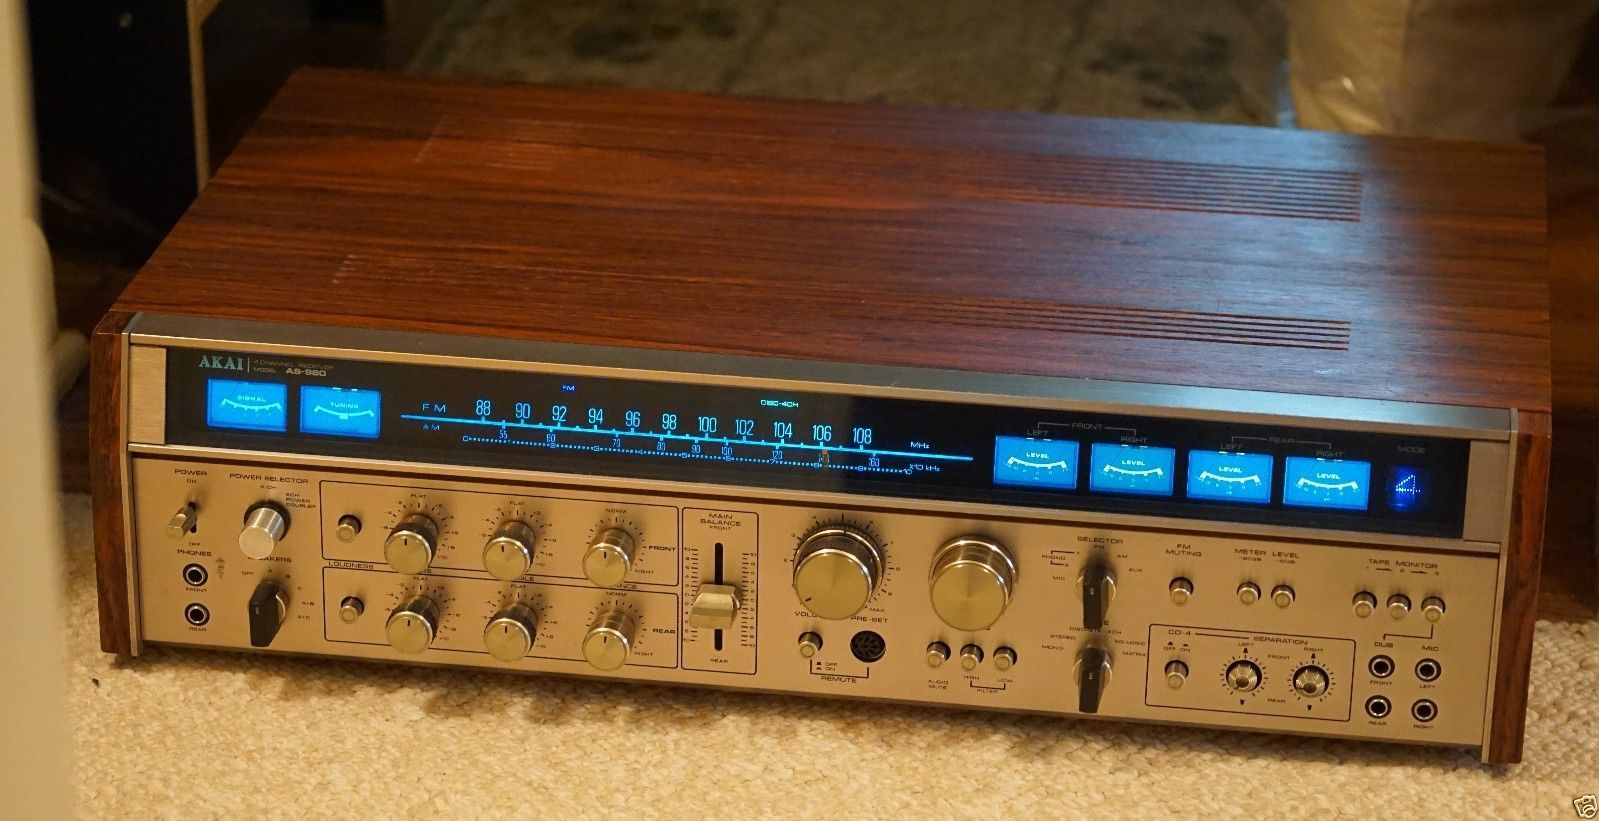 akai as 980 quadraphonic receiver amplifier stereo New Stereo Quadraphonic Amplifier New Stereo Quadraphonic Amplifier